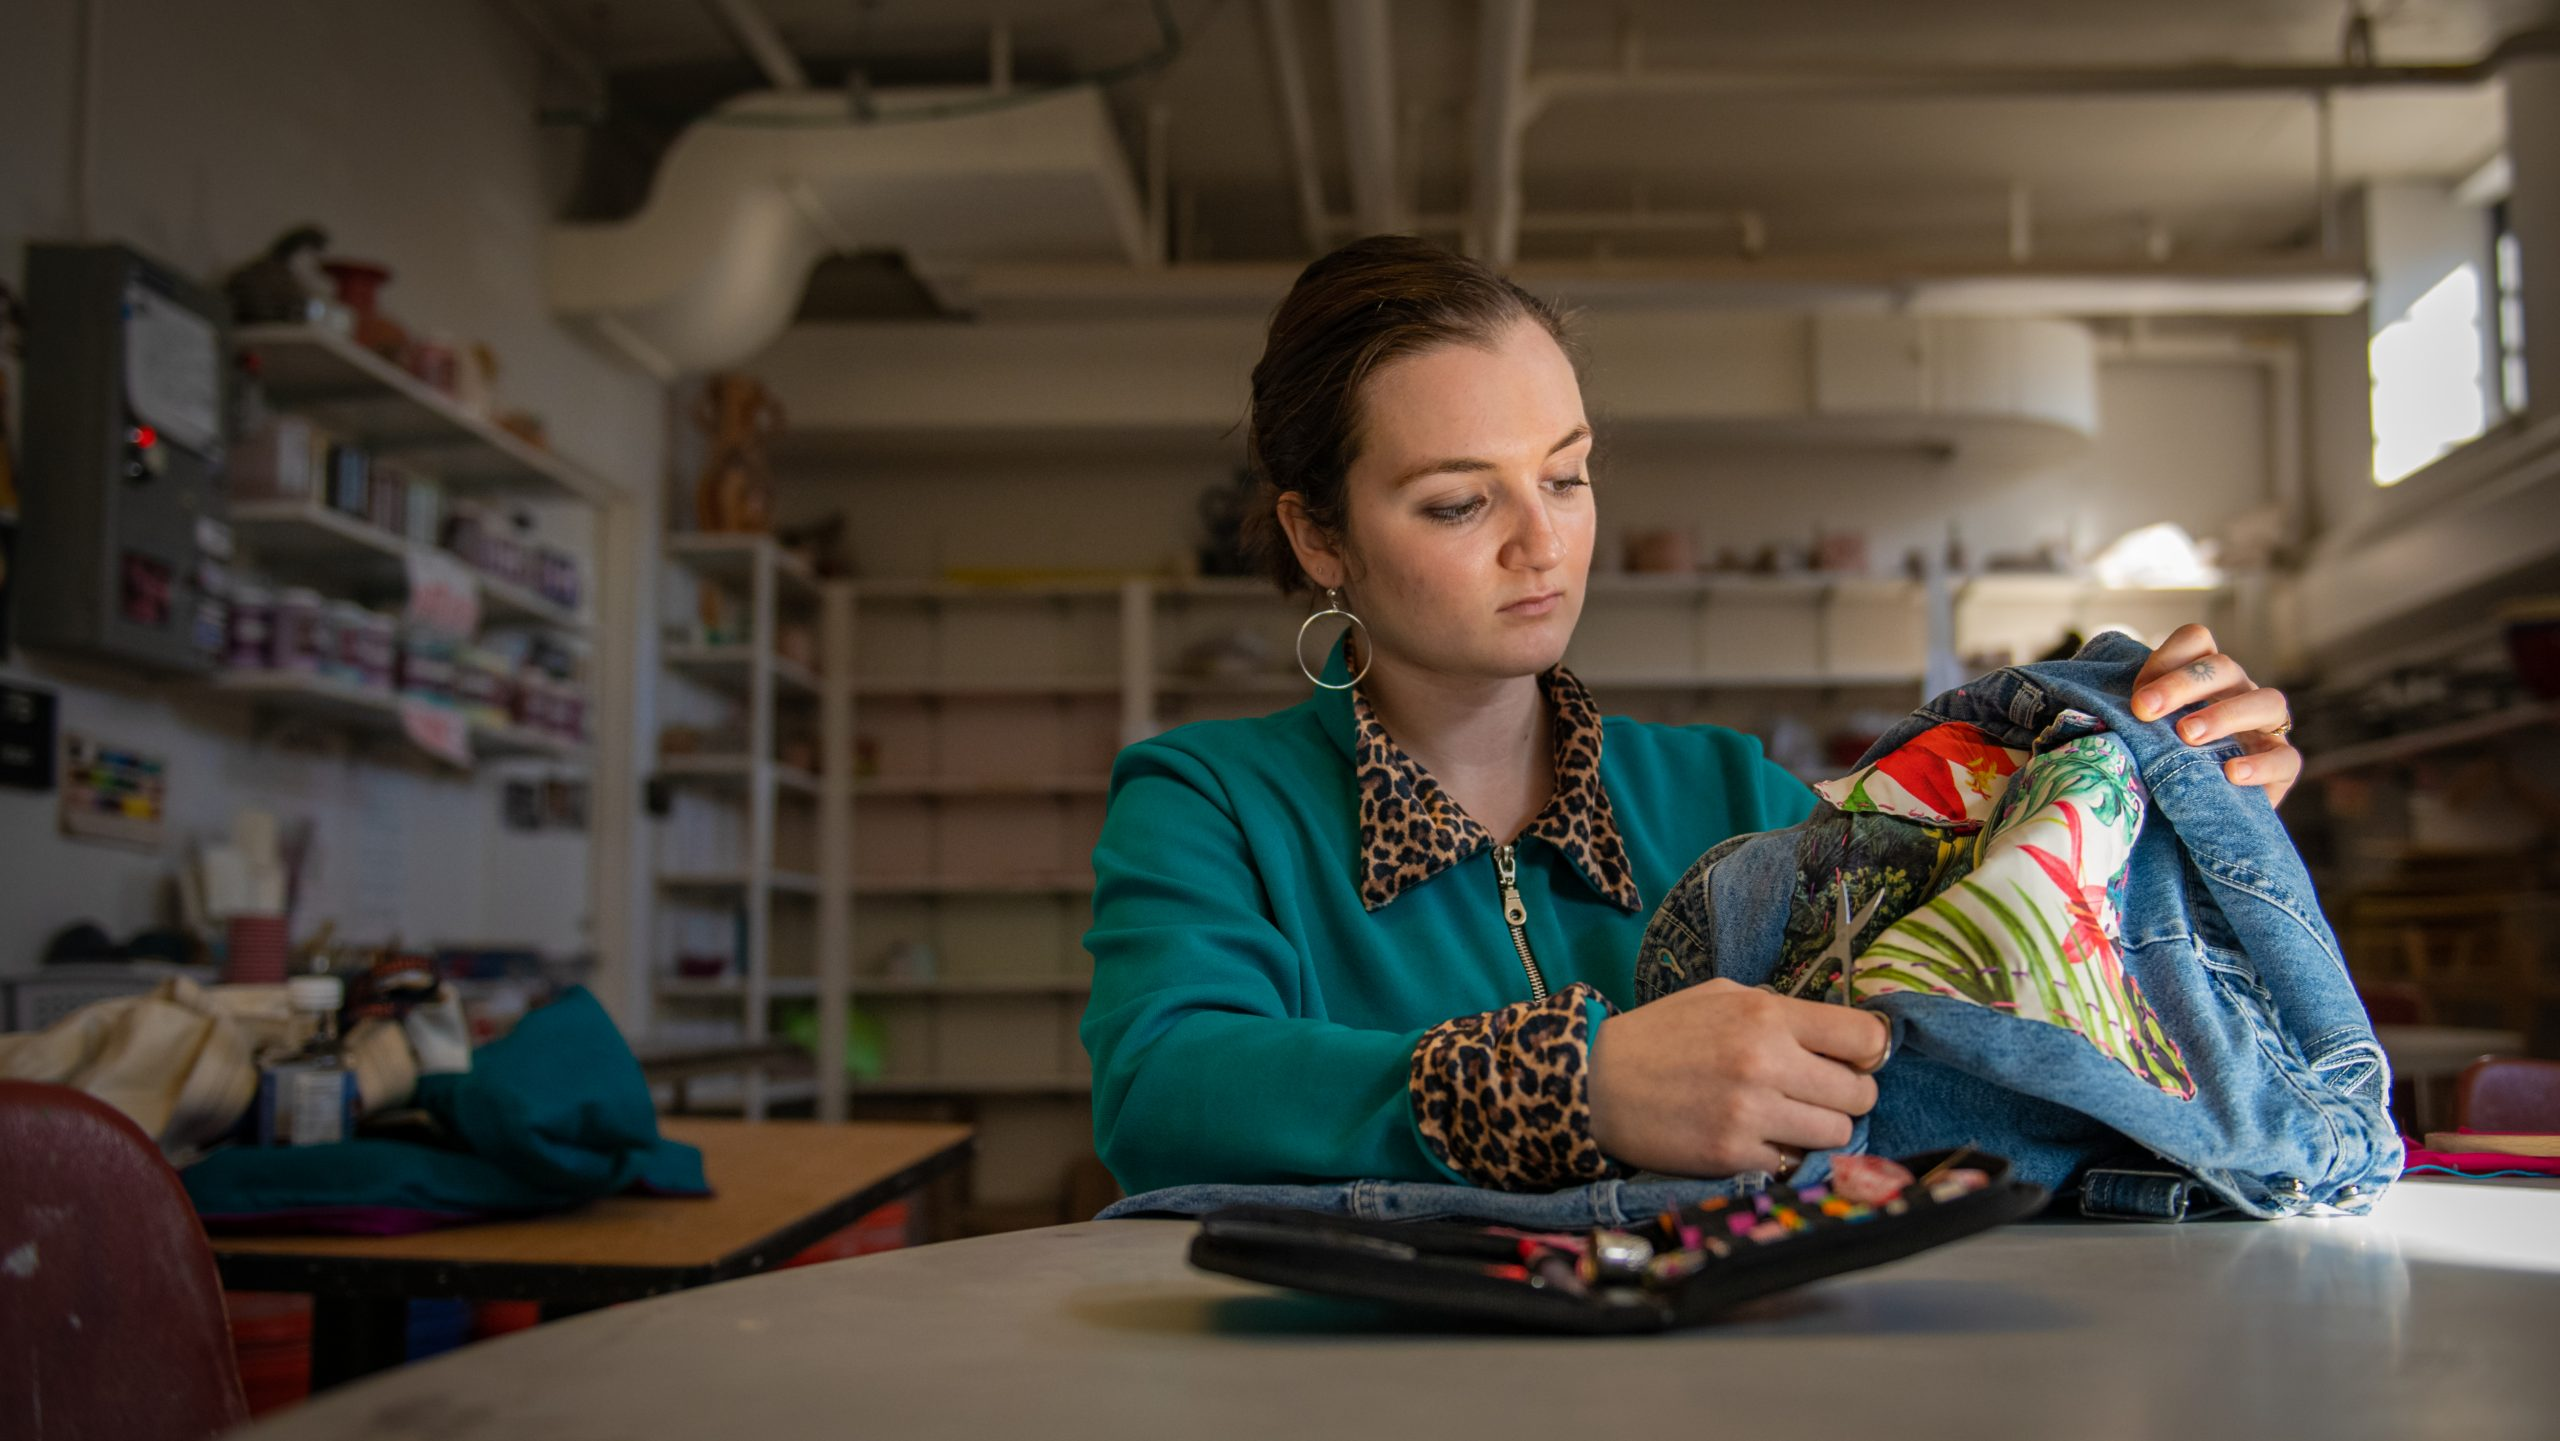 Alli Jutras looks at clothing